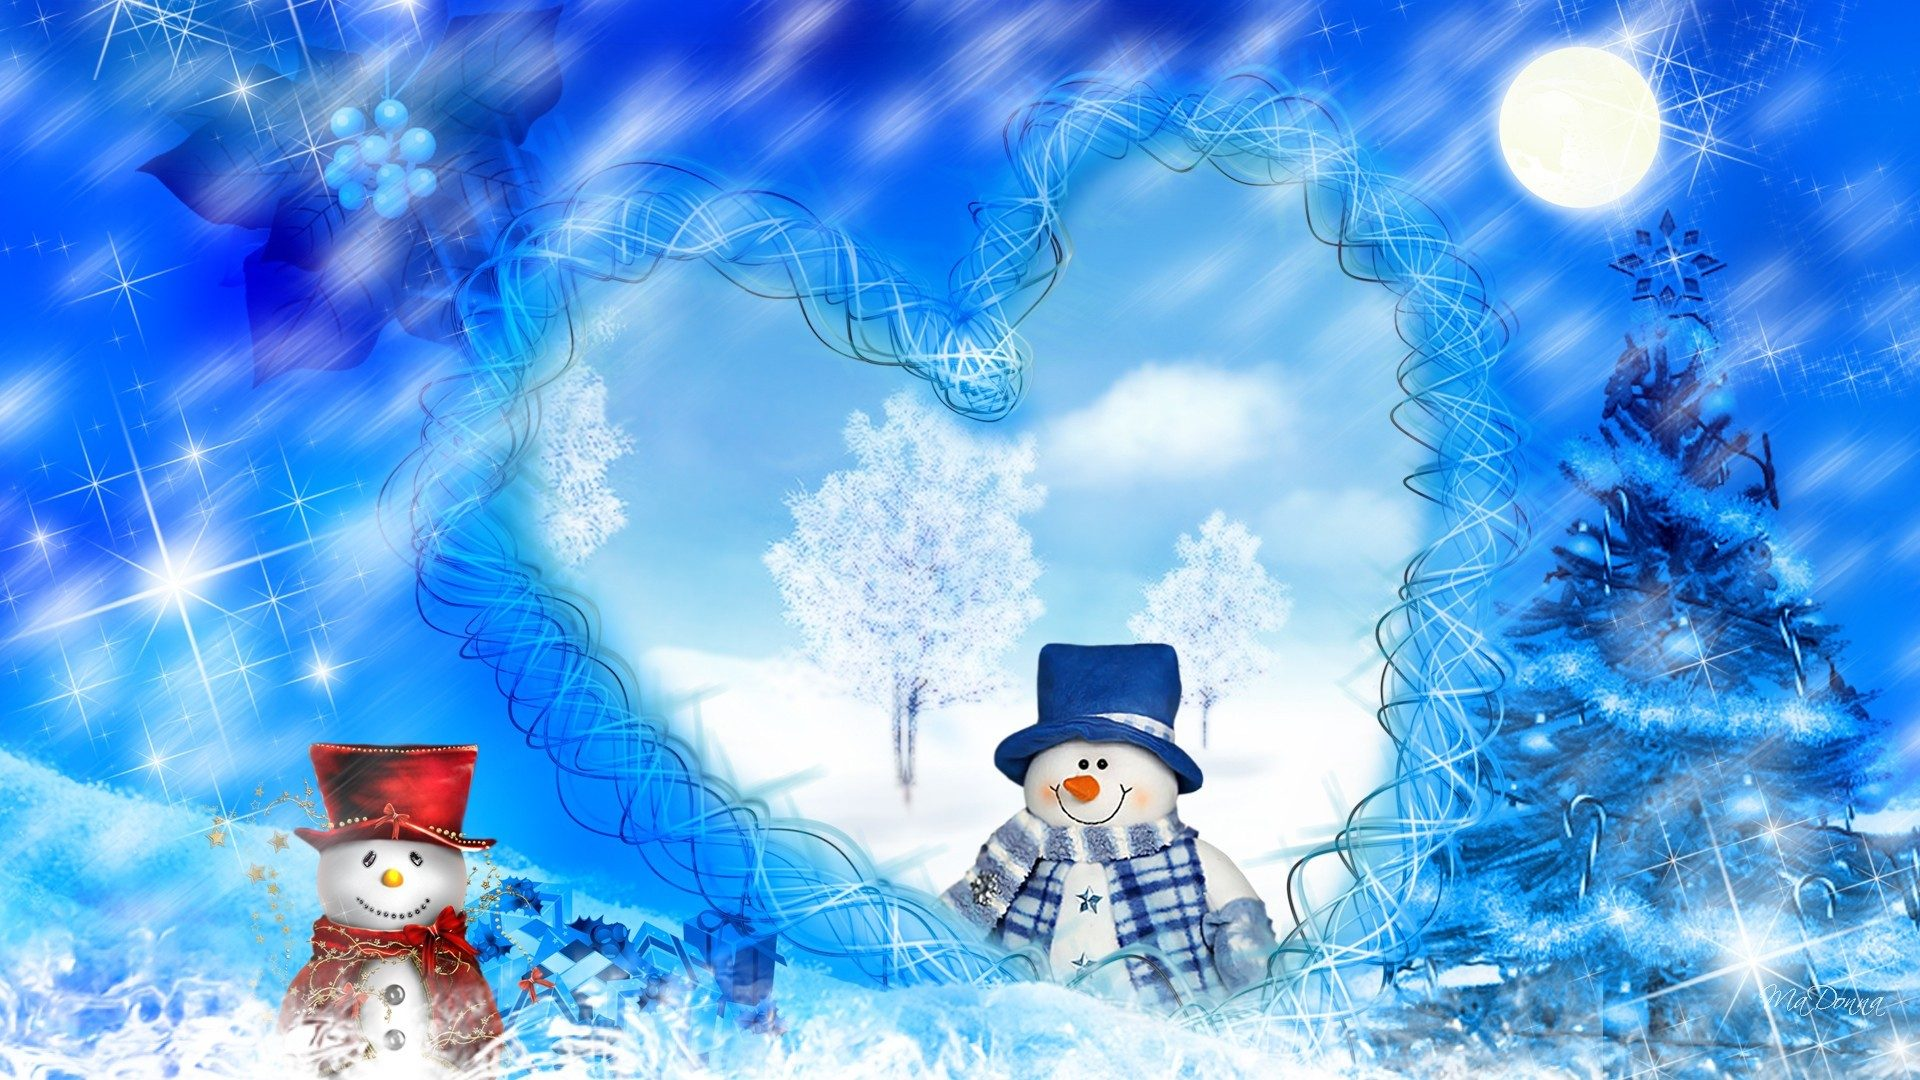 winter wallpaper download   SF Wallpaper 1920x1080